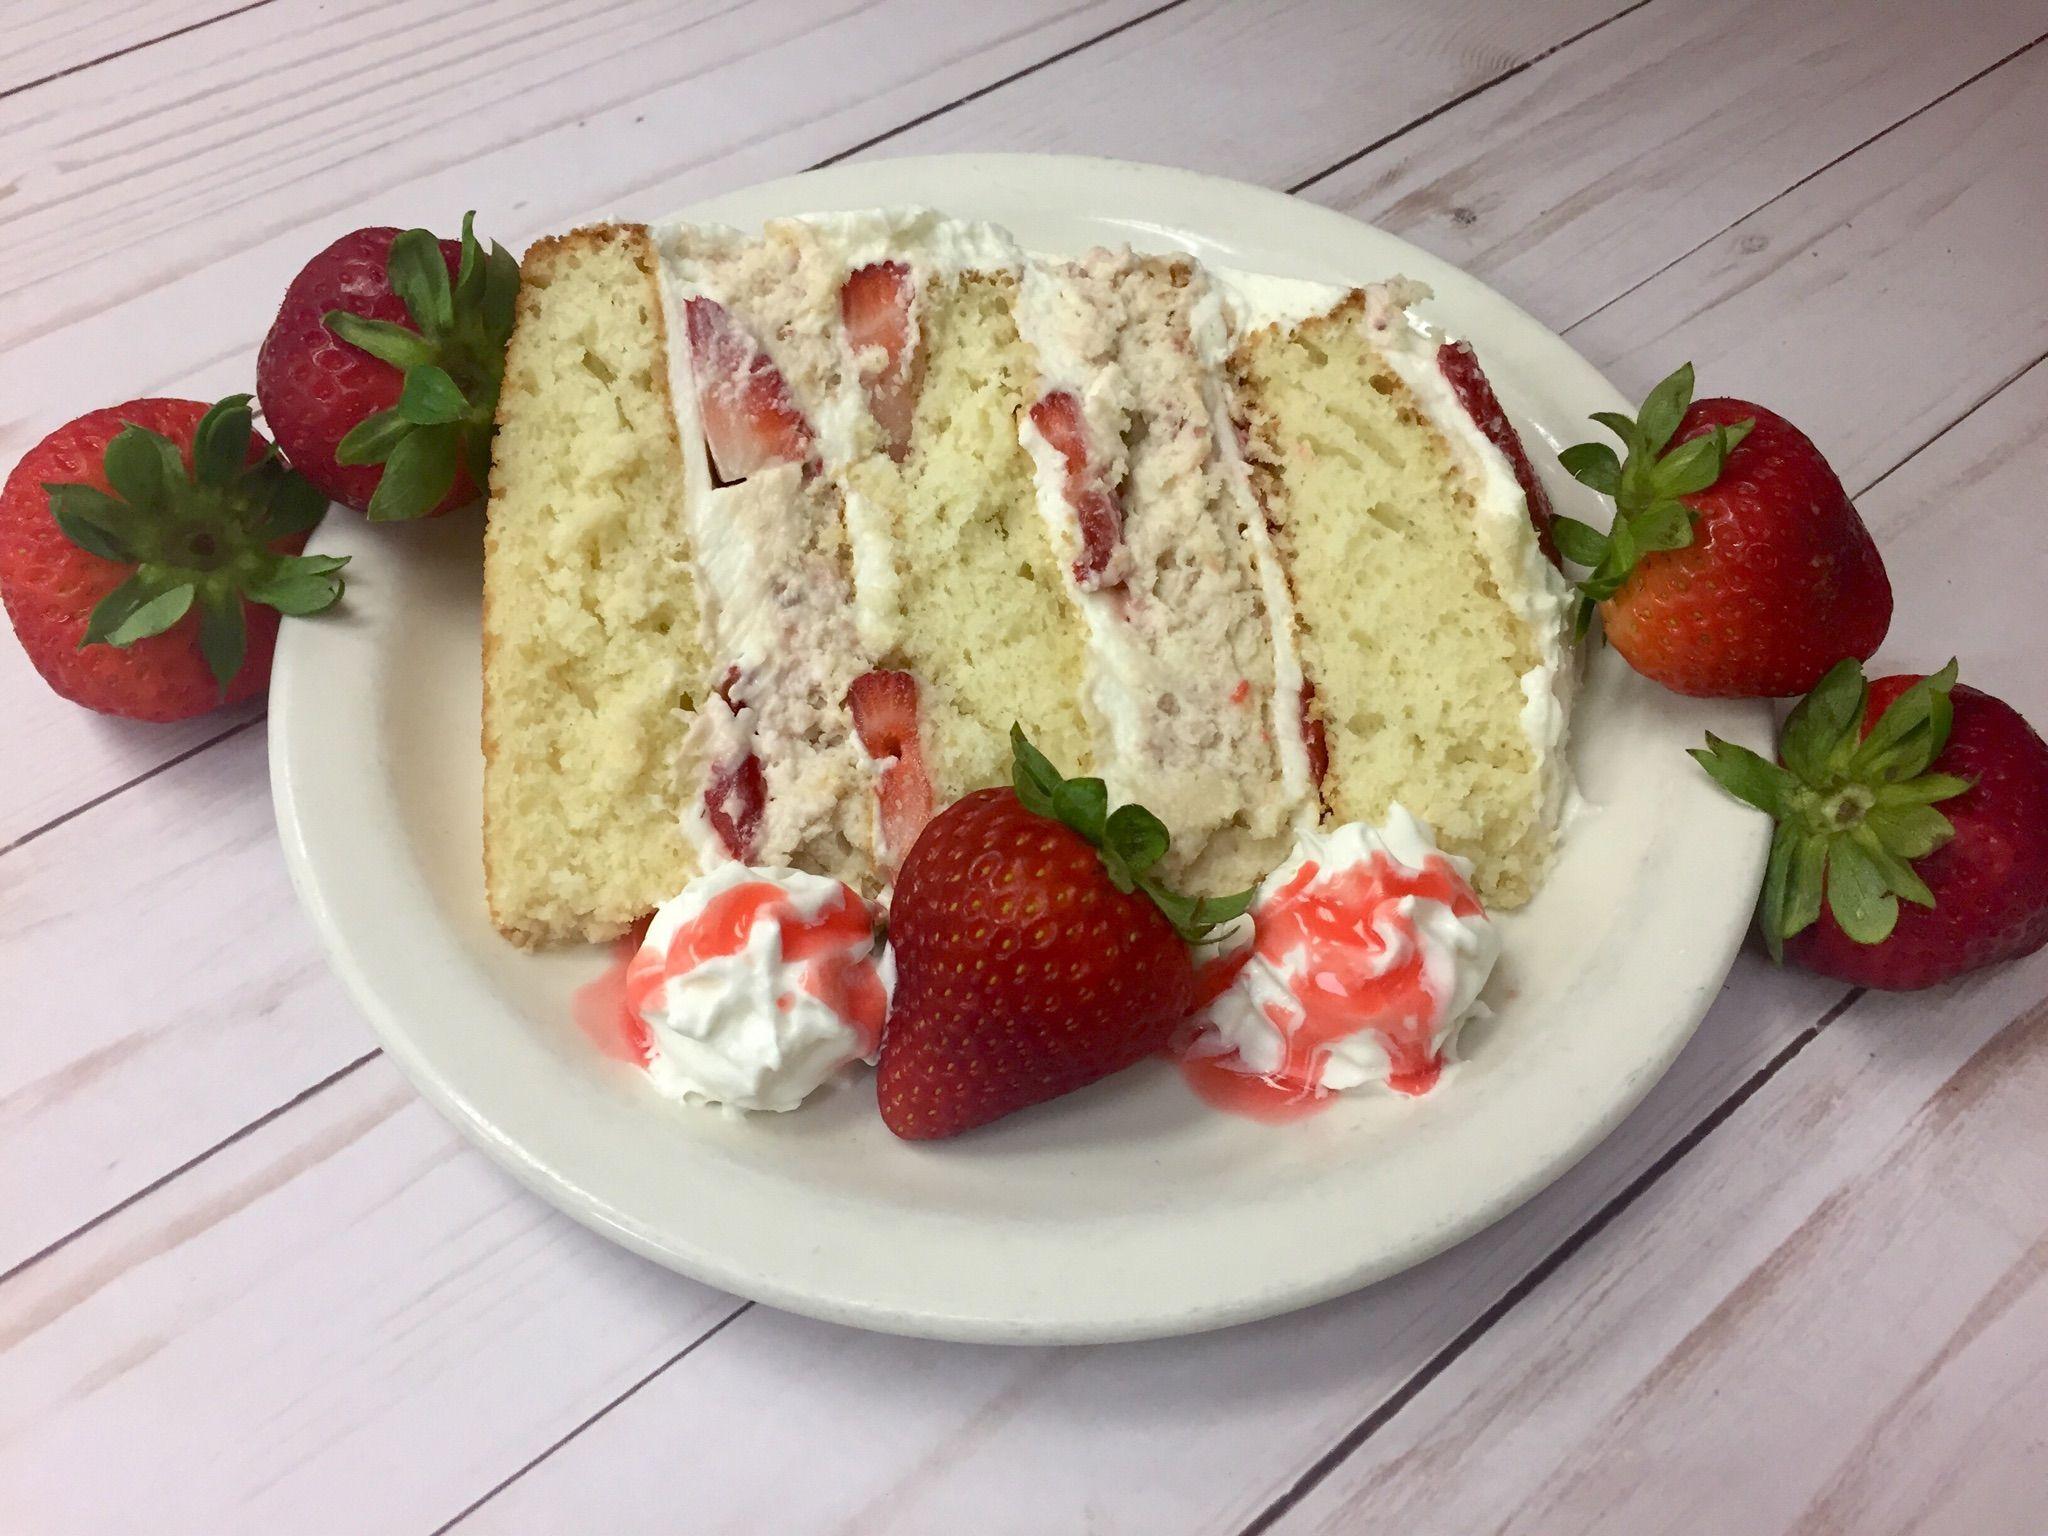 Strawberry Dream Cake Desserts, Homemade desserts, Fun